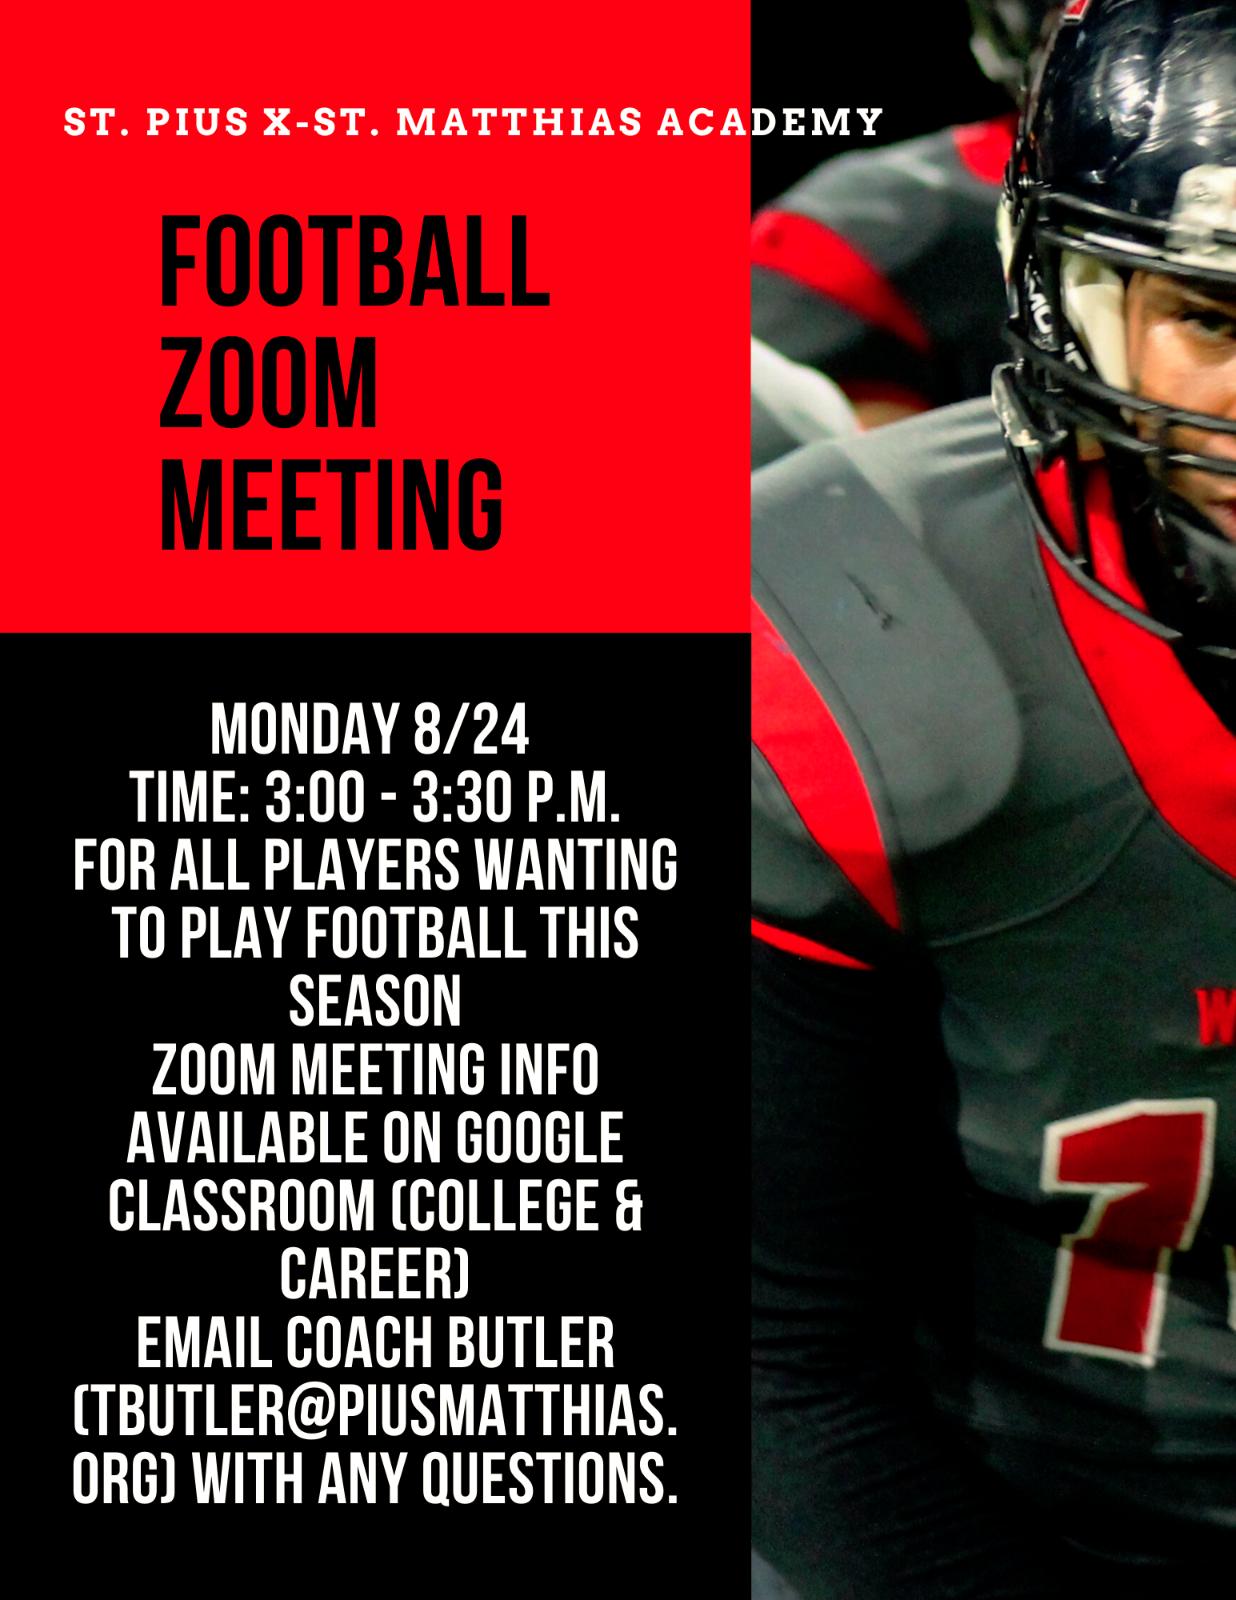 Football Zoom Meeting